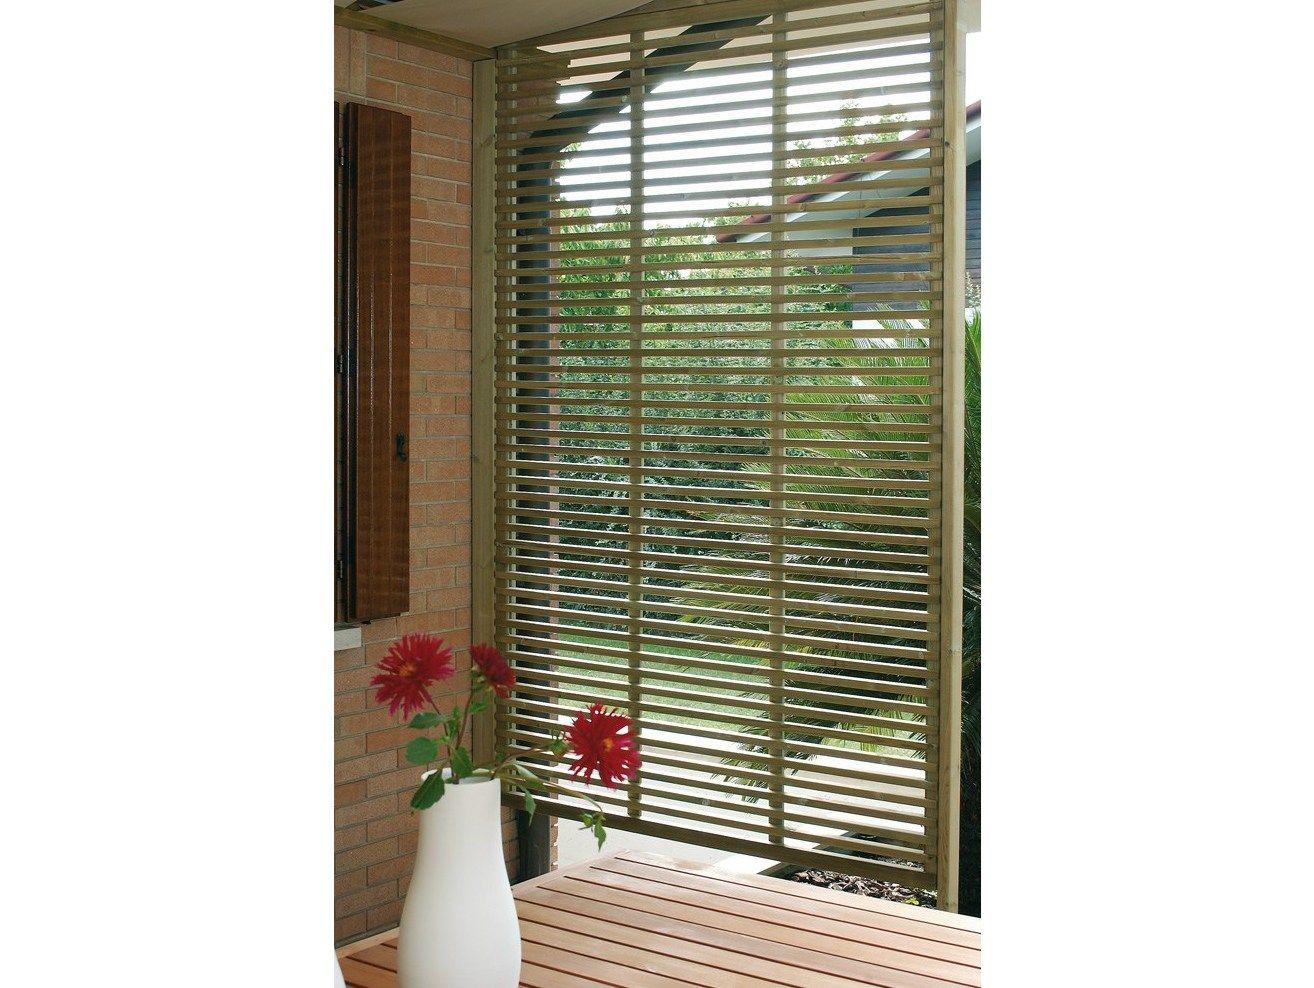 Spazio schermo divisorio da giardino by legnolandia for Divisori da giardino